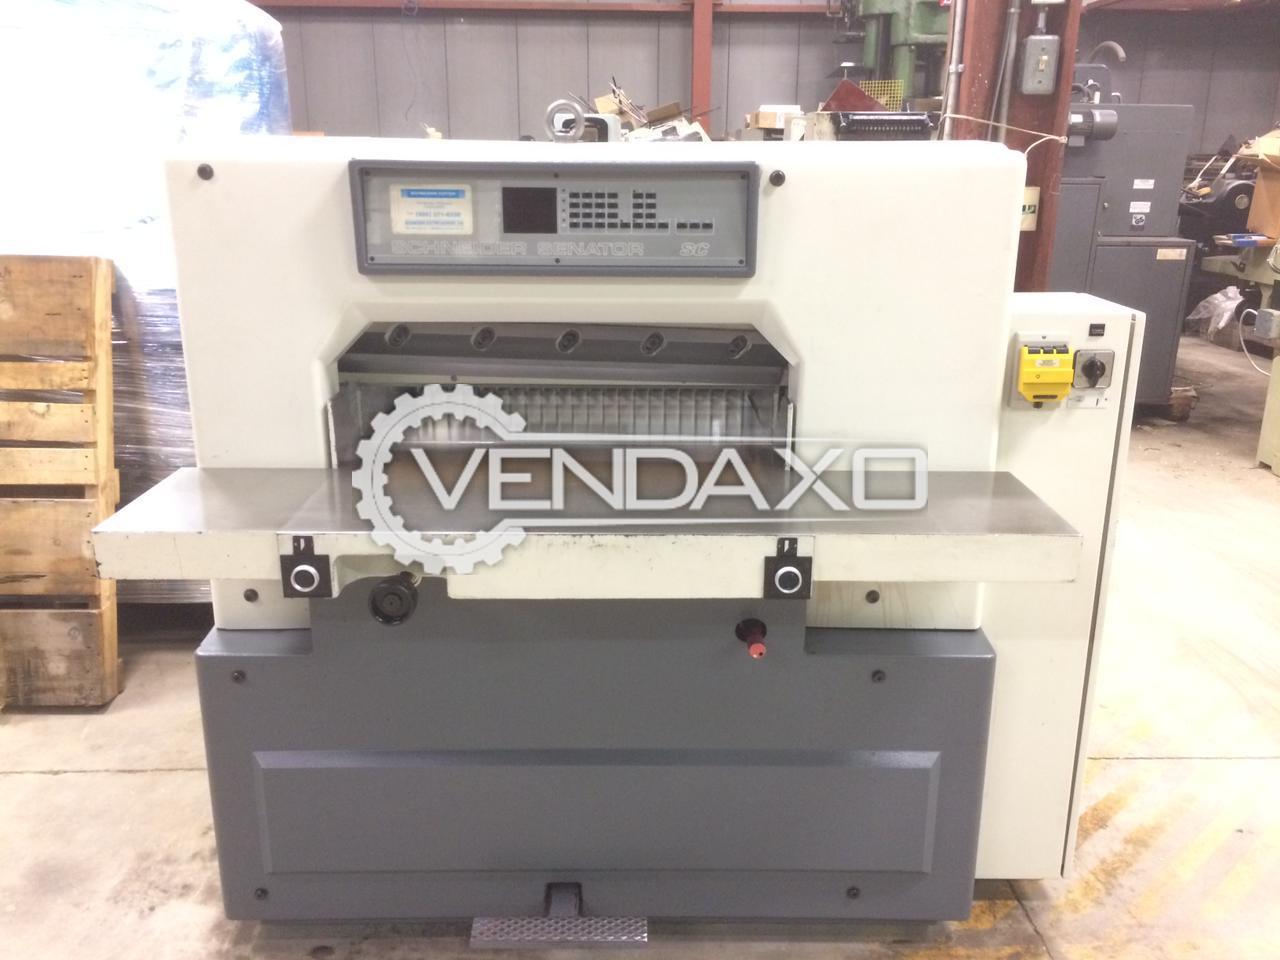 Schneider Senator 76 Paper Cutting Machine - 30 Inch